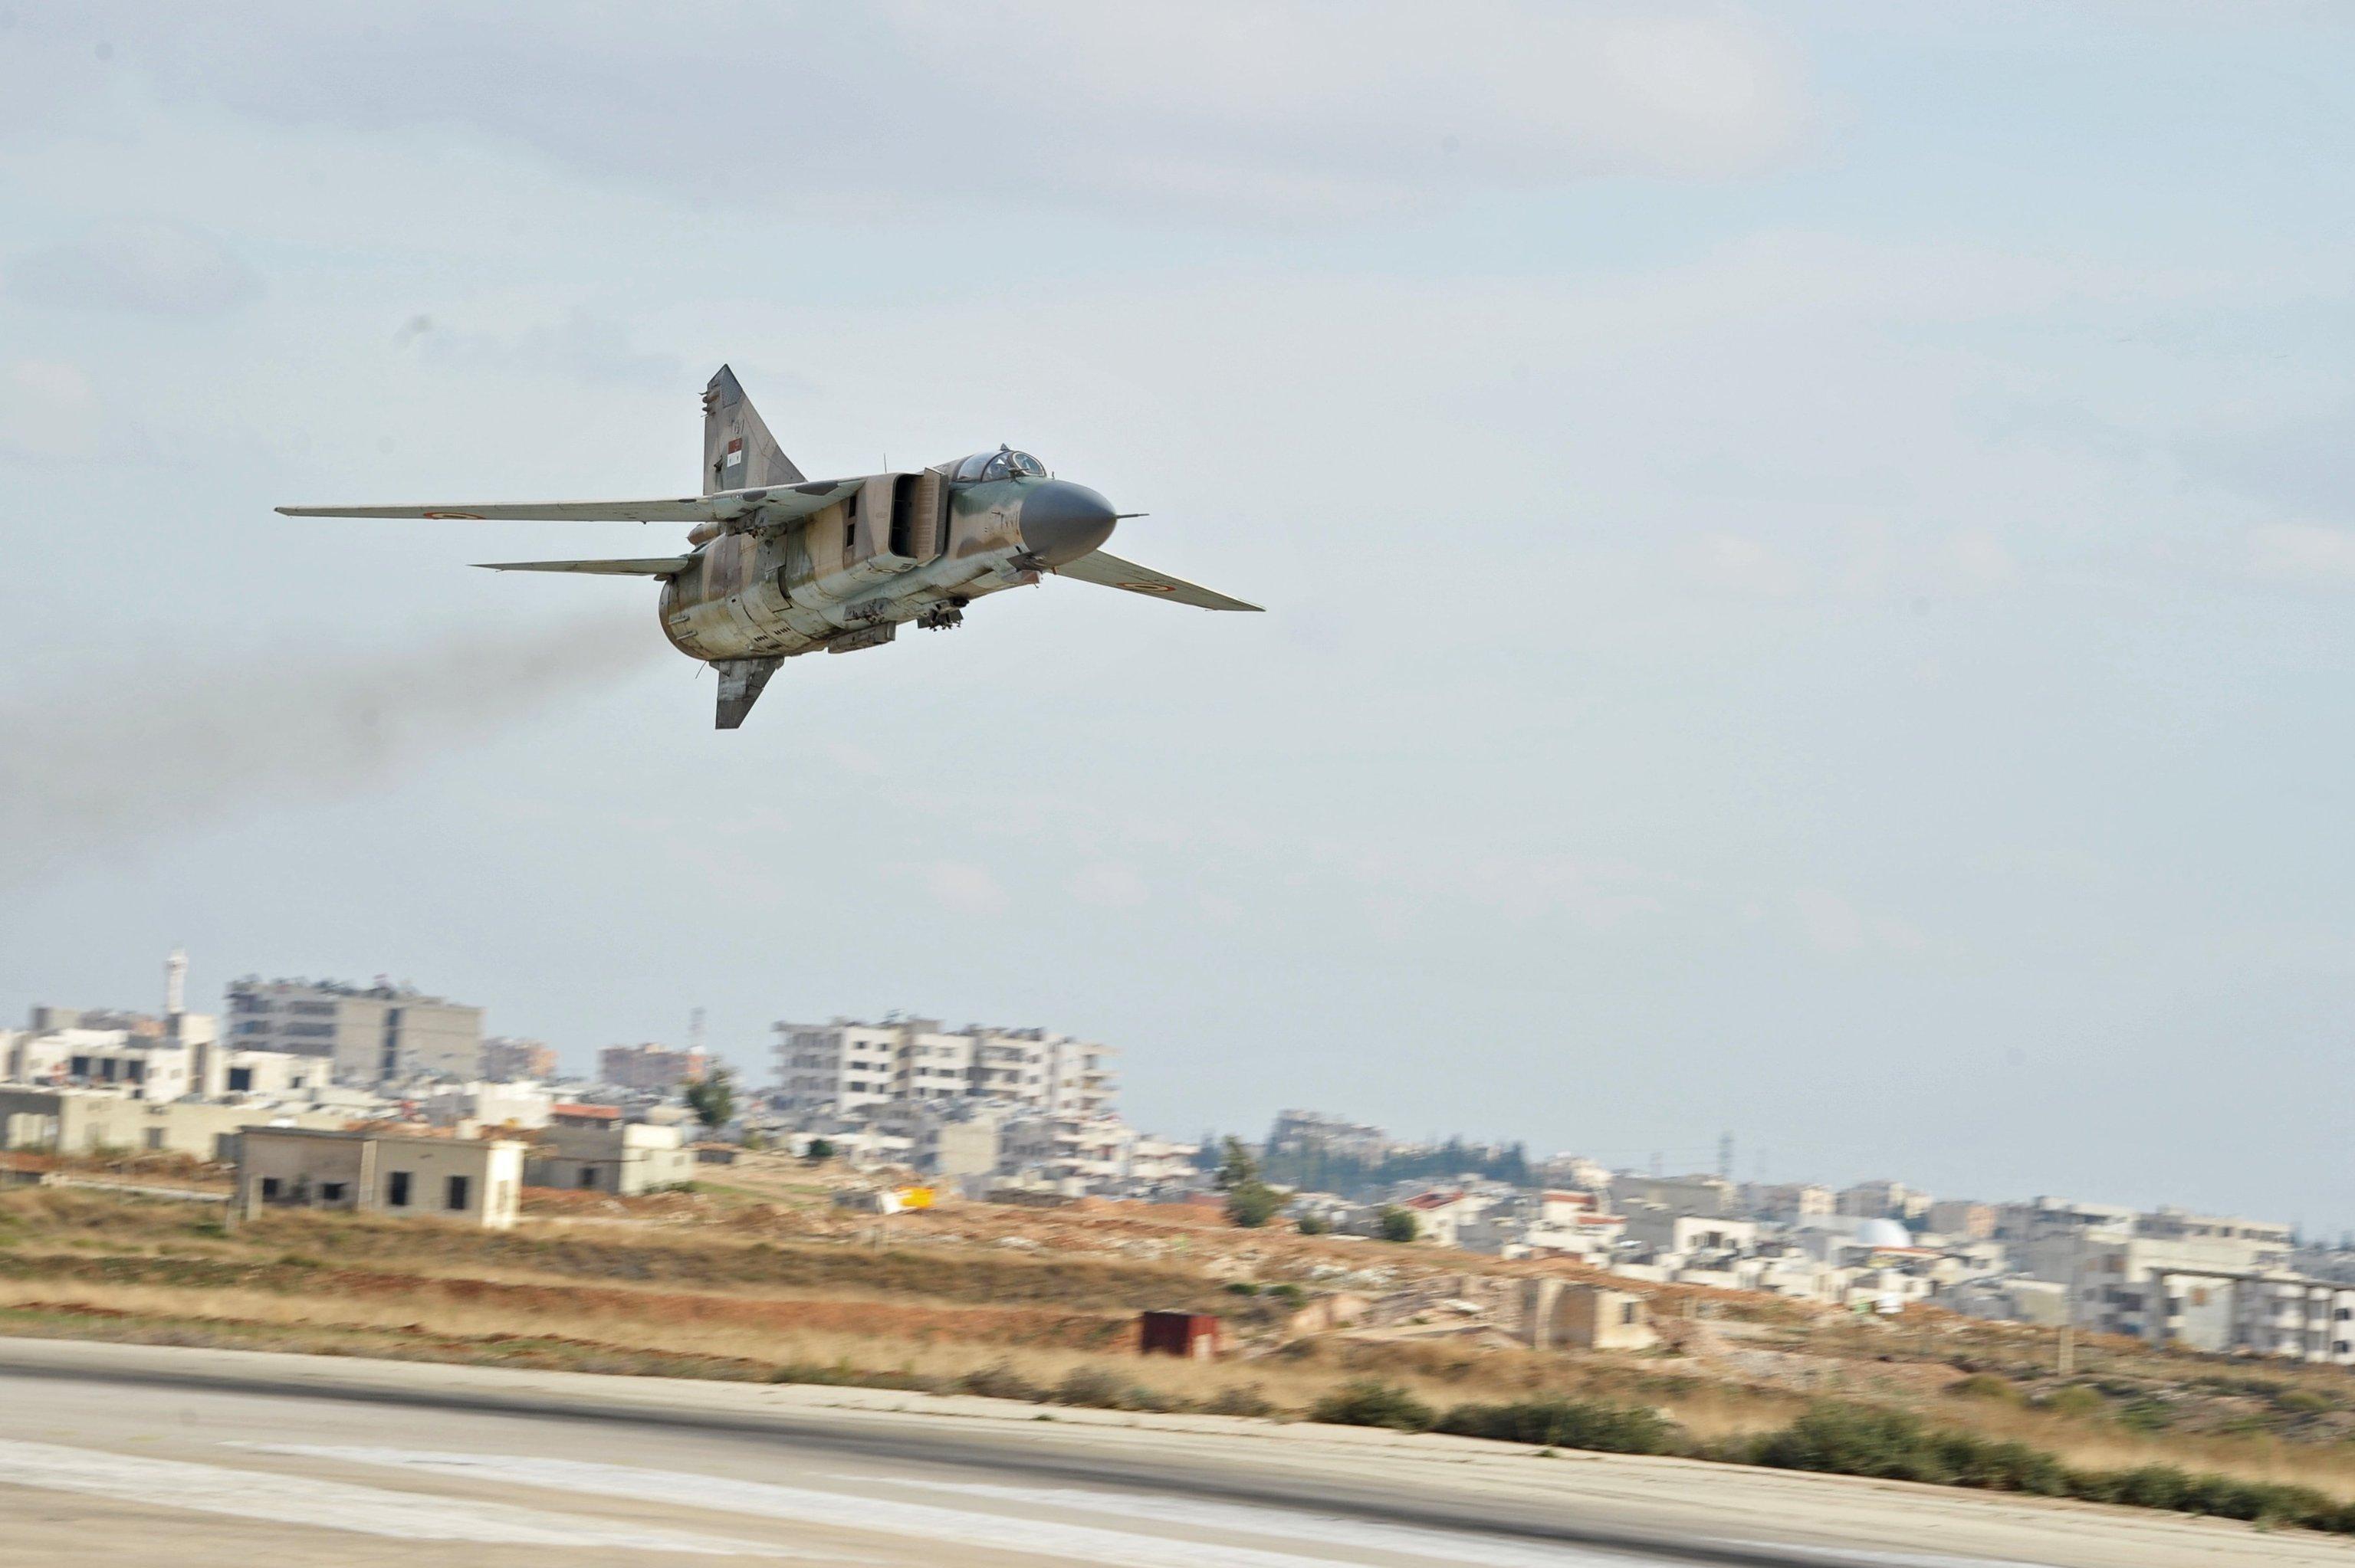 Syrian Warplanes Strike Again Turkish Military in Northern Syria - Report